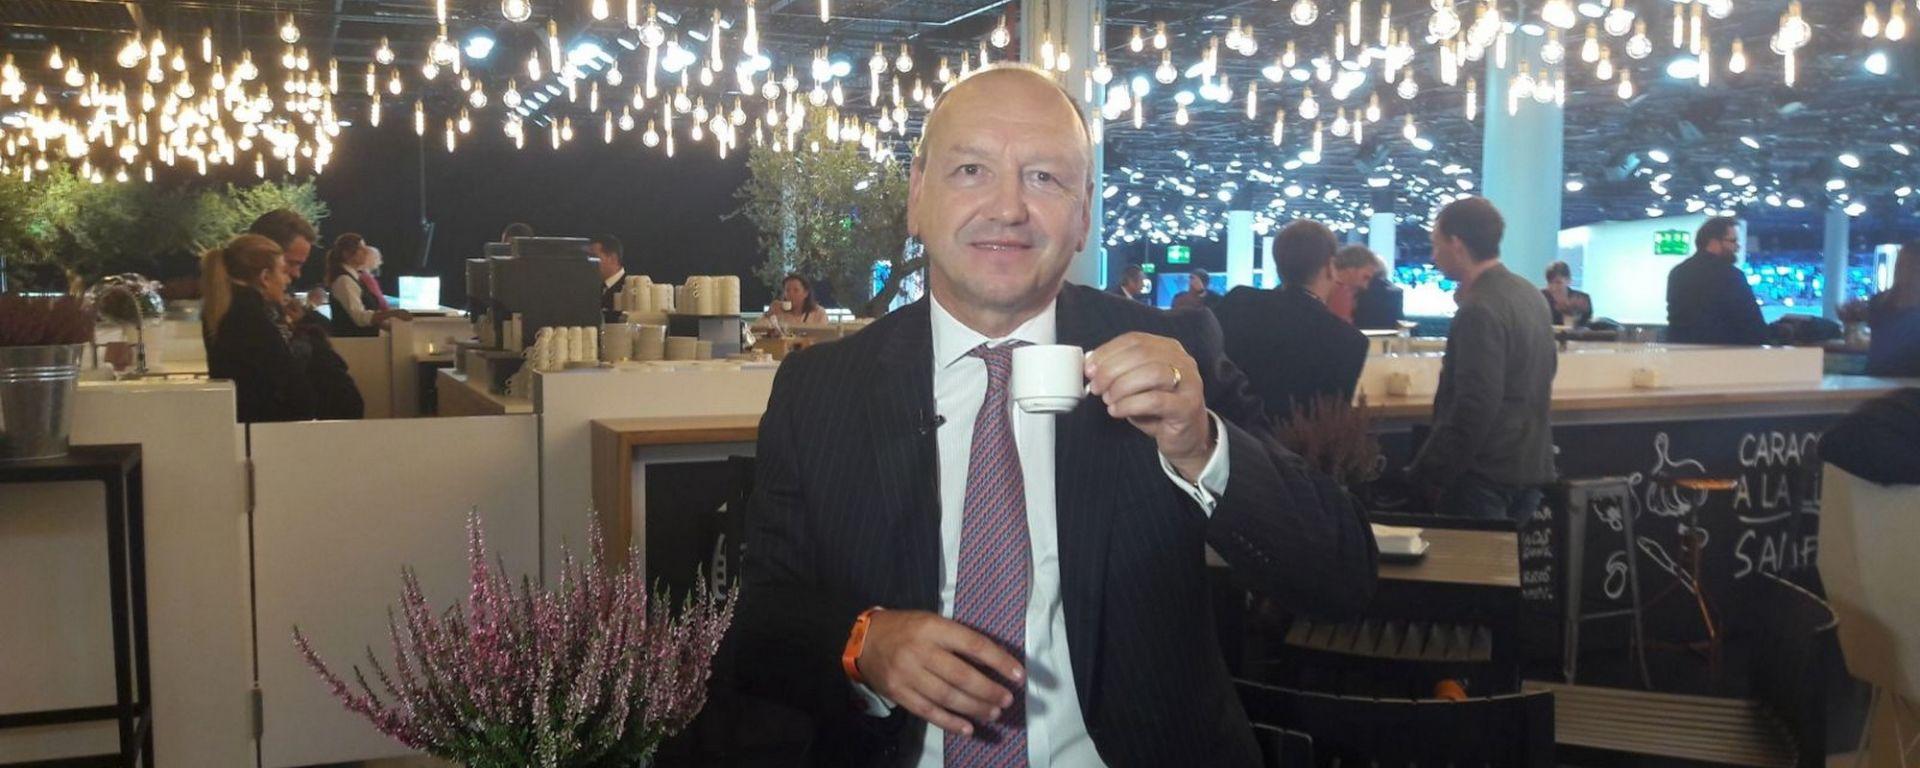 Le novità Seat raccontate da Peter Wyhinny, Direttore di Seat Italia